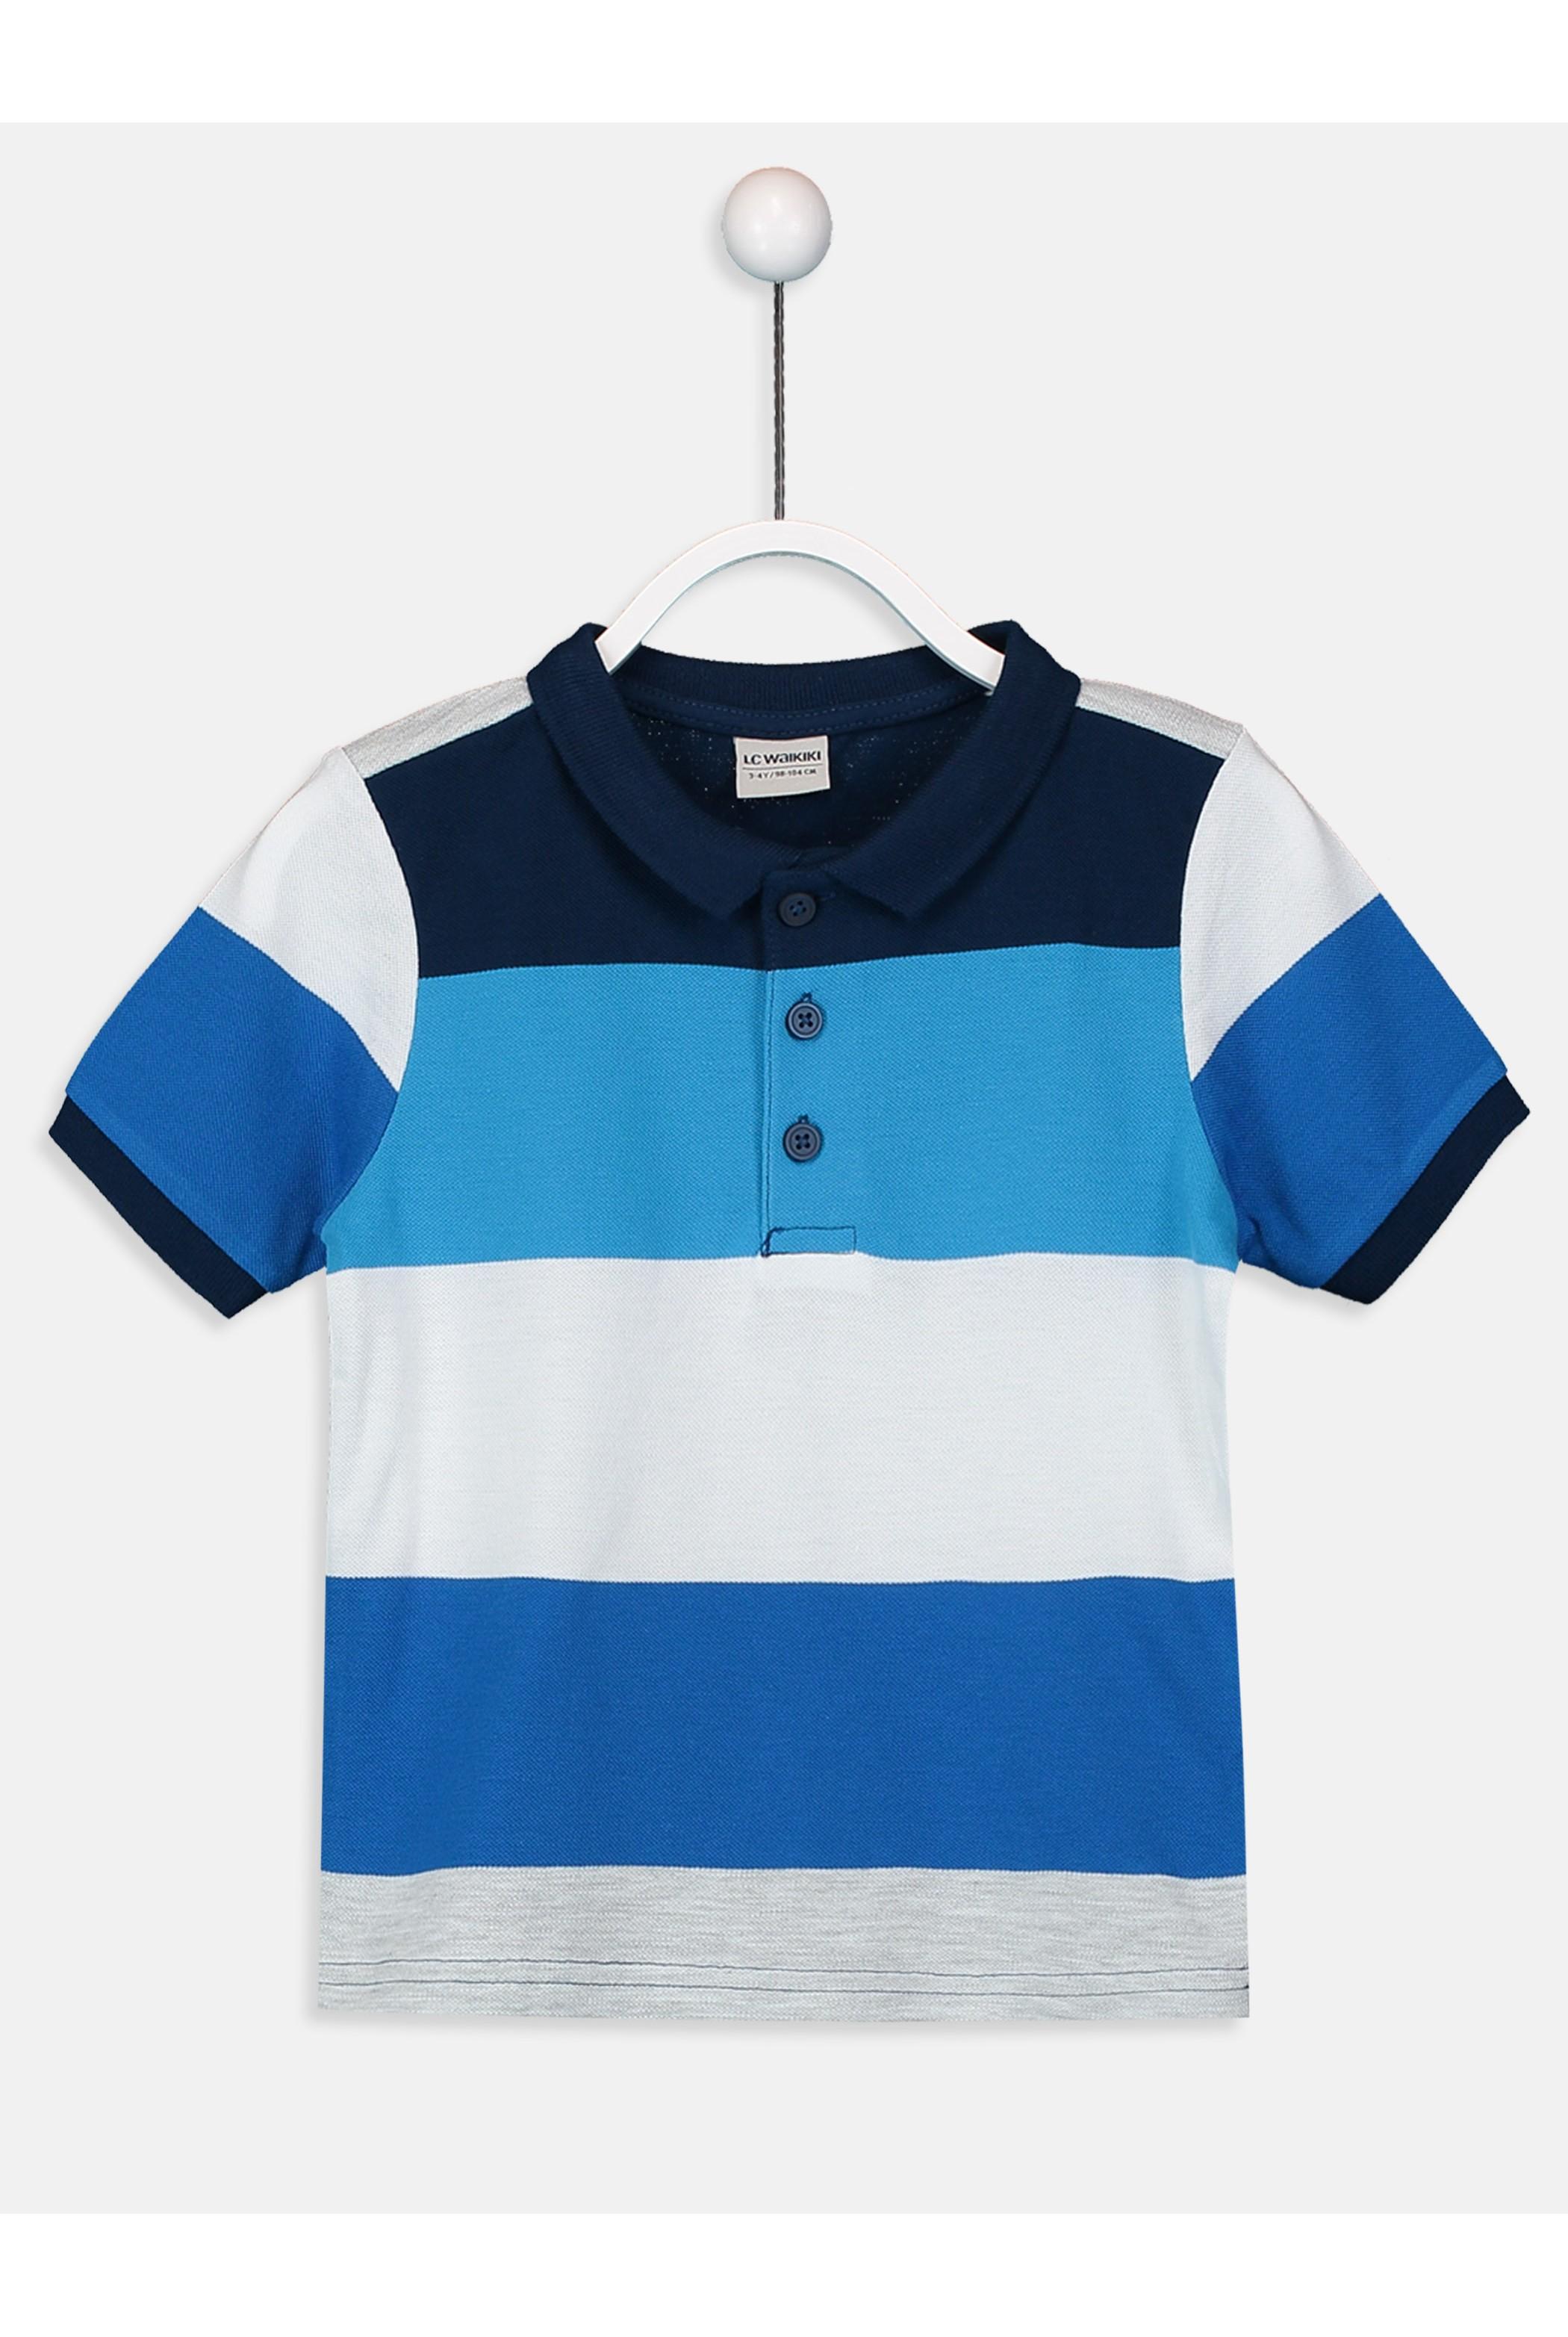 47153ce4e ملابس الاطفال   السي وايكيكي Lcwaikiki   تسوق اون لاين في تركيا   سوق ادويت